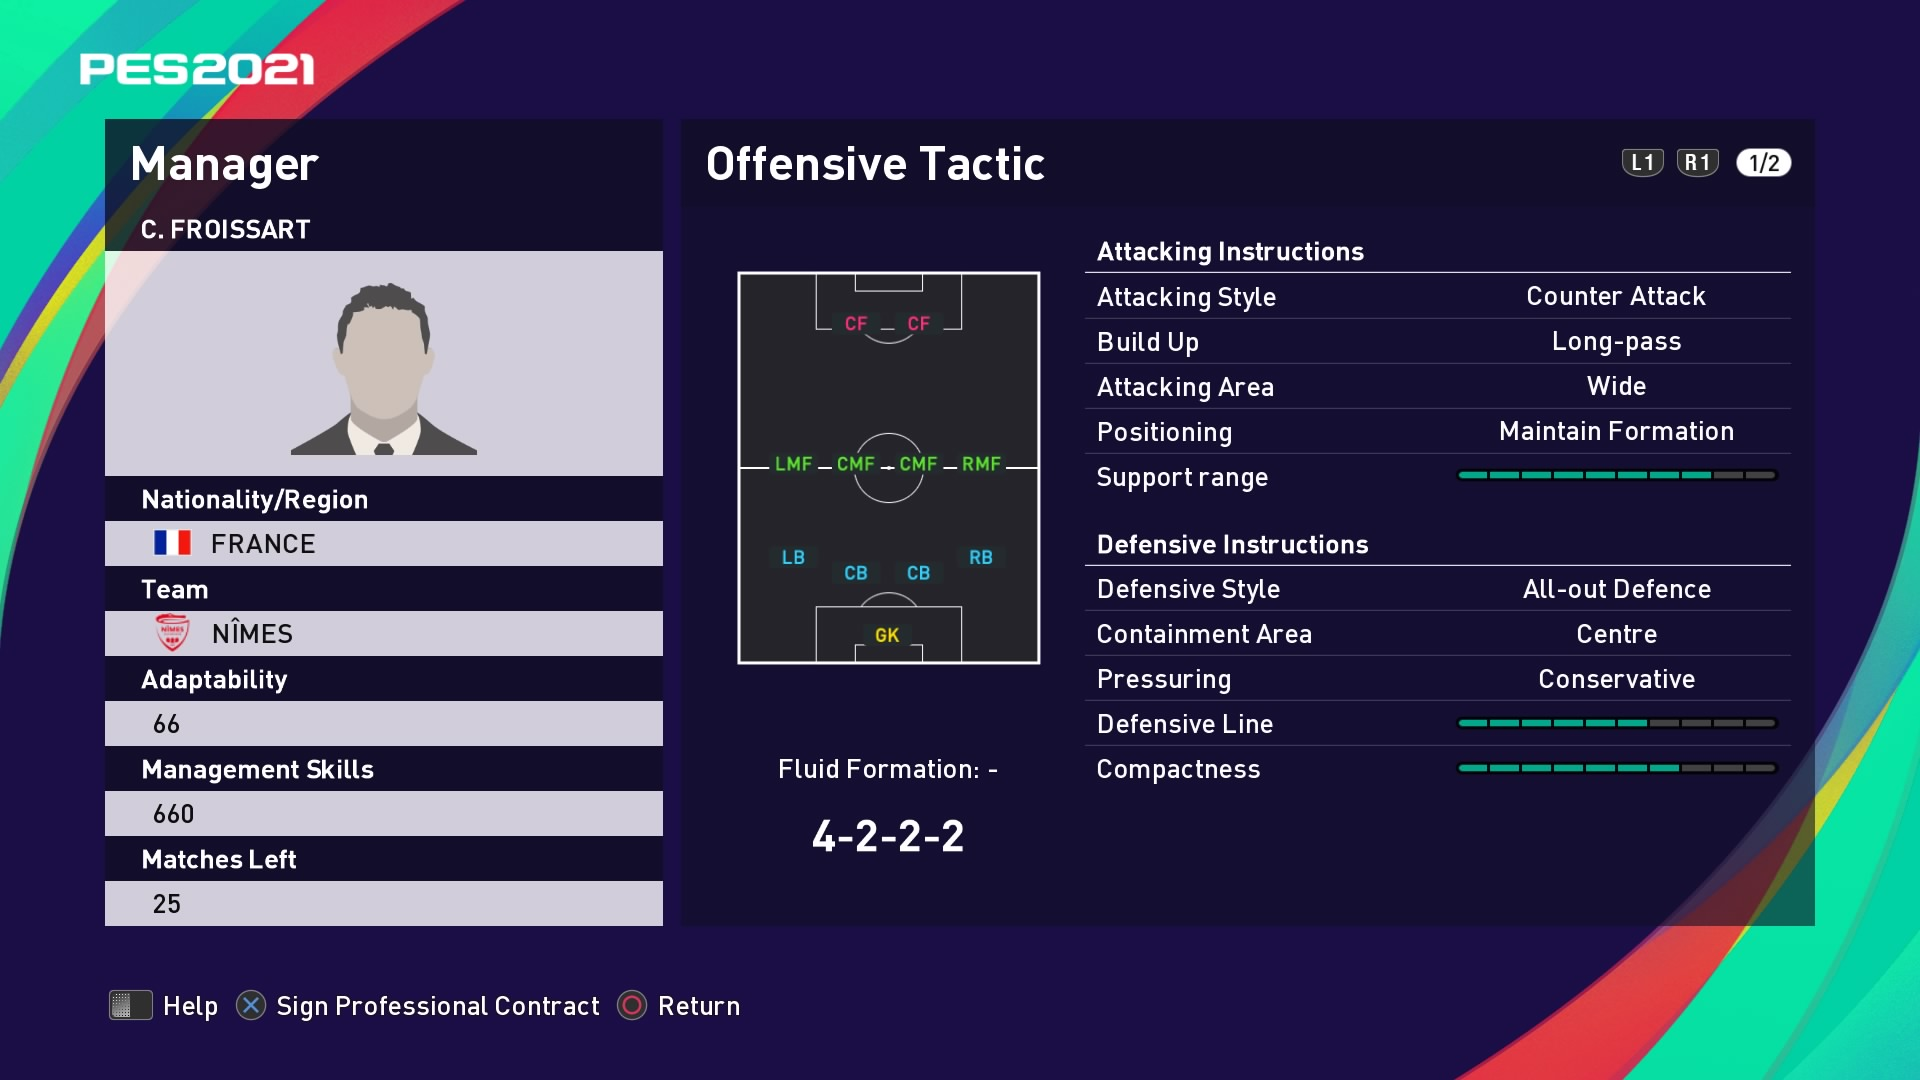 C. Froissart (Bernard Blaquart) Offensive Tactic in PES 2021 myClub